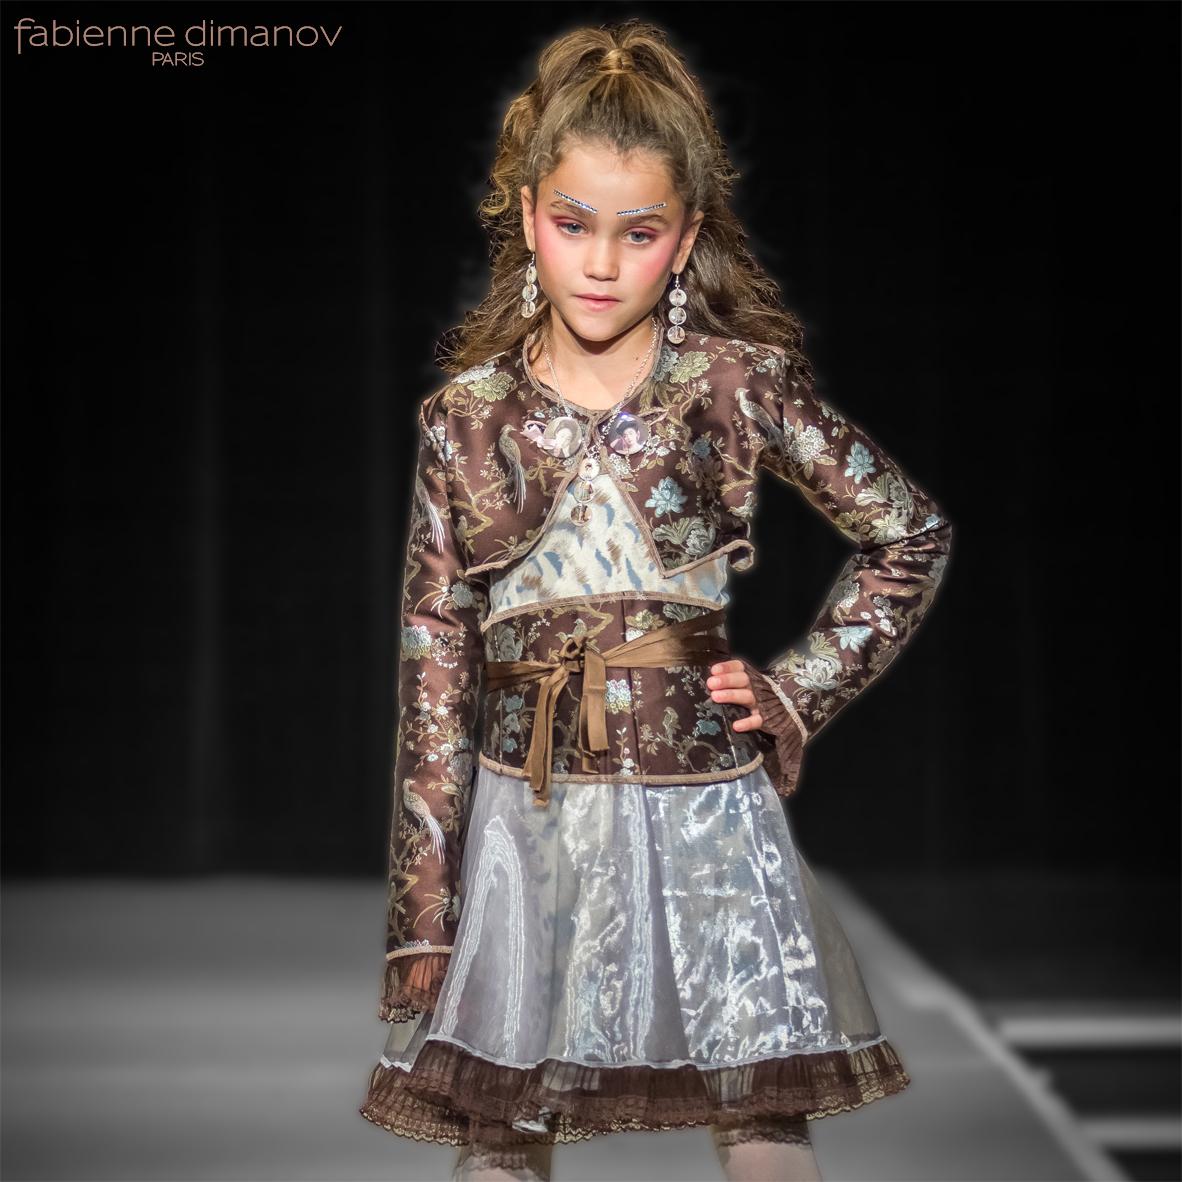 Tokyo - cortège fillette - Fabienne Dimanov Paris